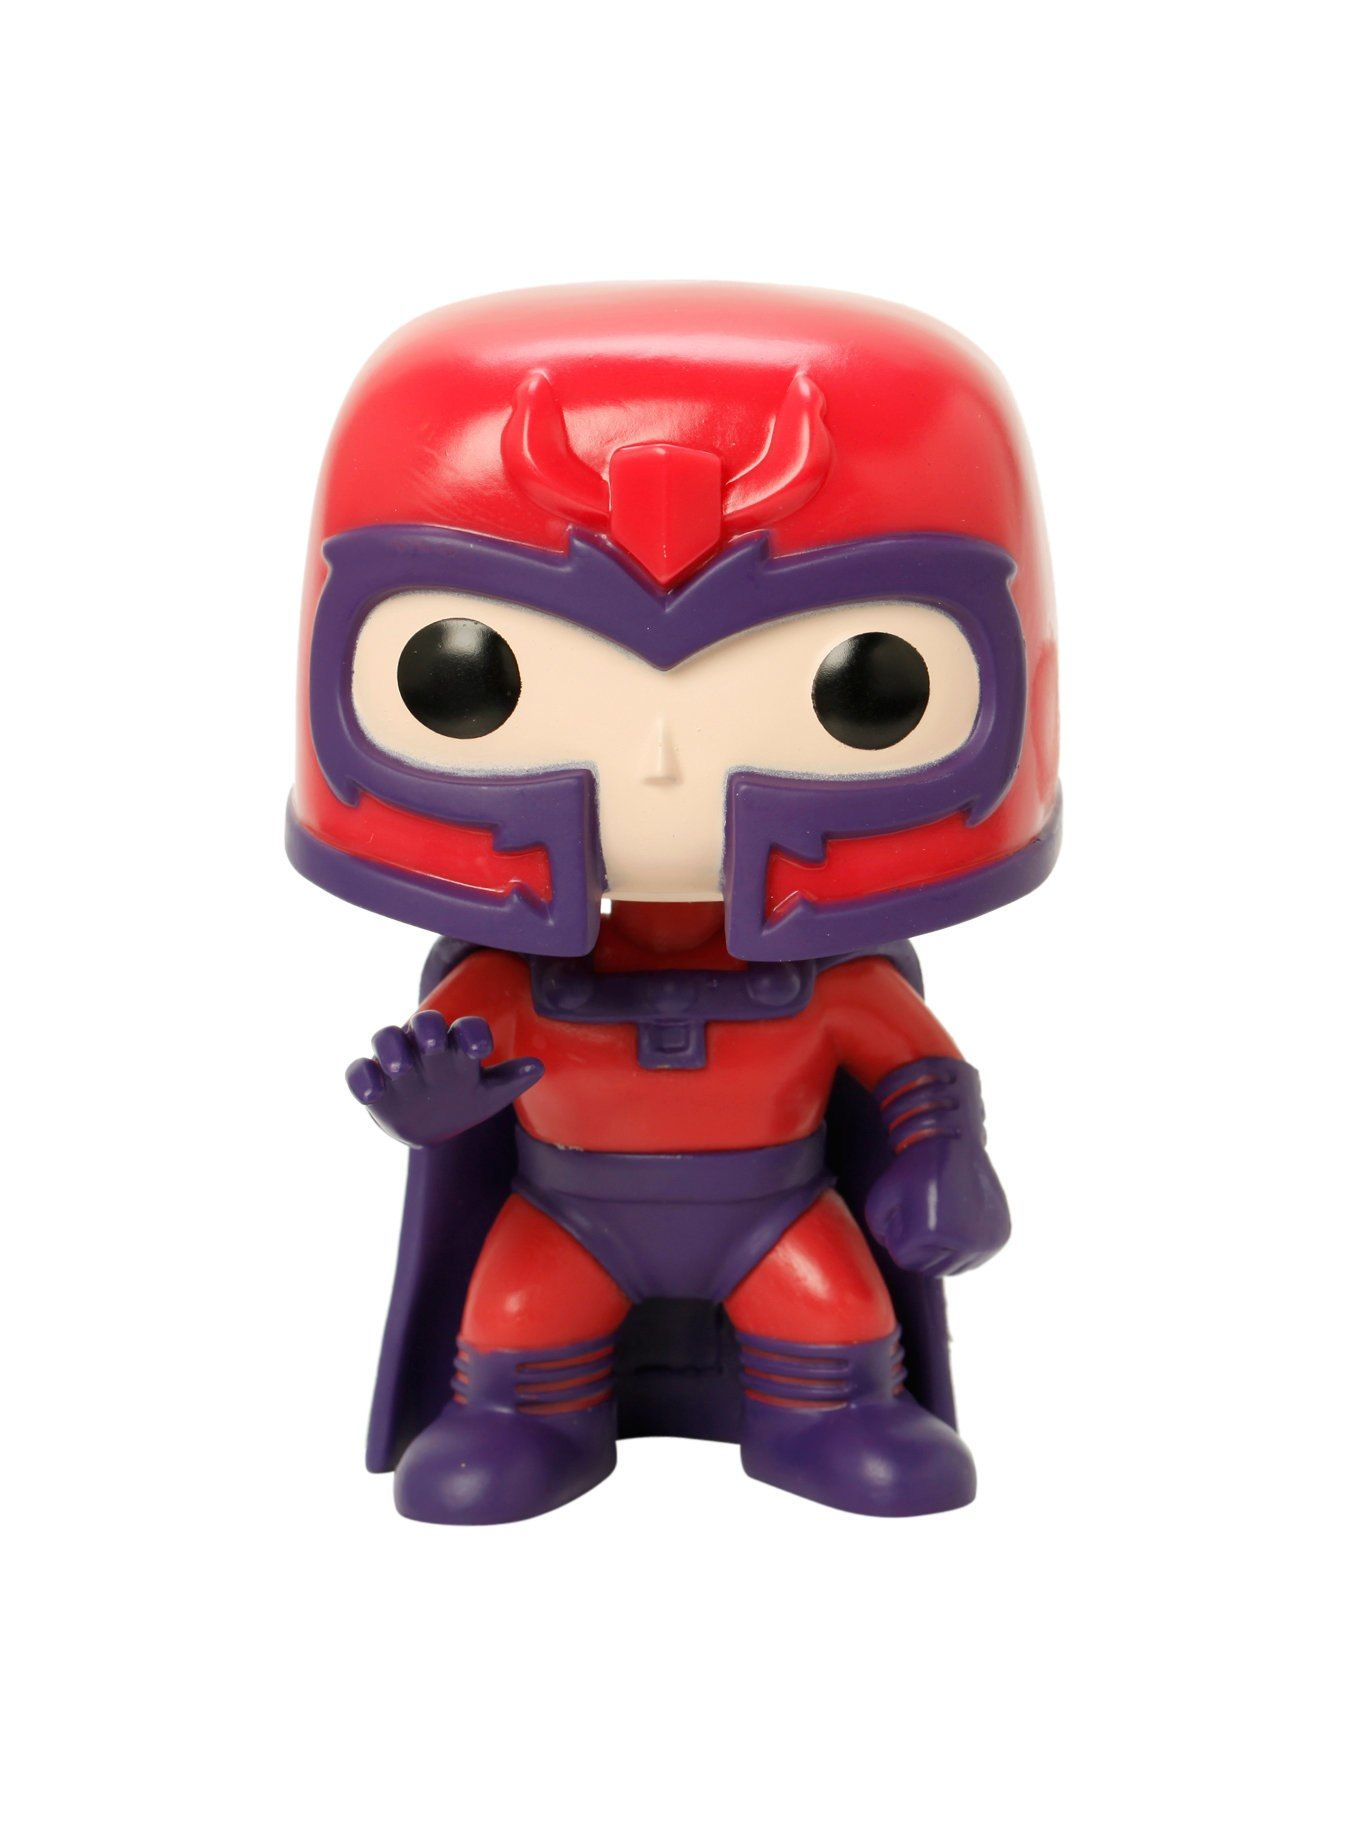 Magneto #62 - X-Men - Funko Pop! Marvel